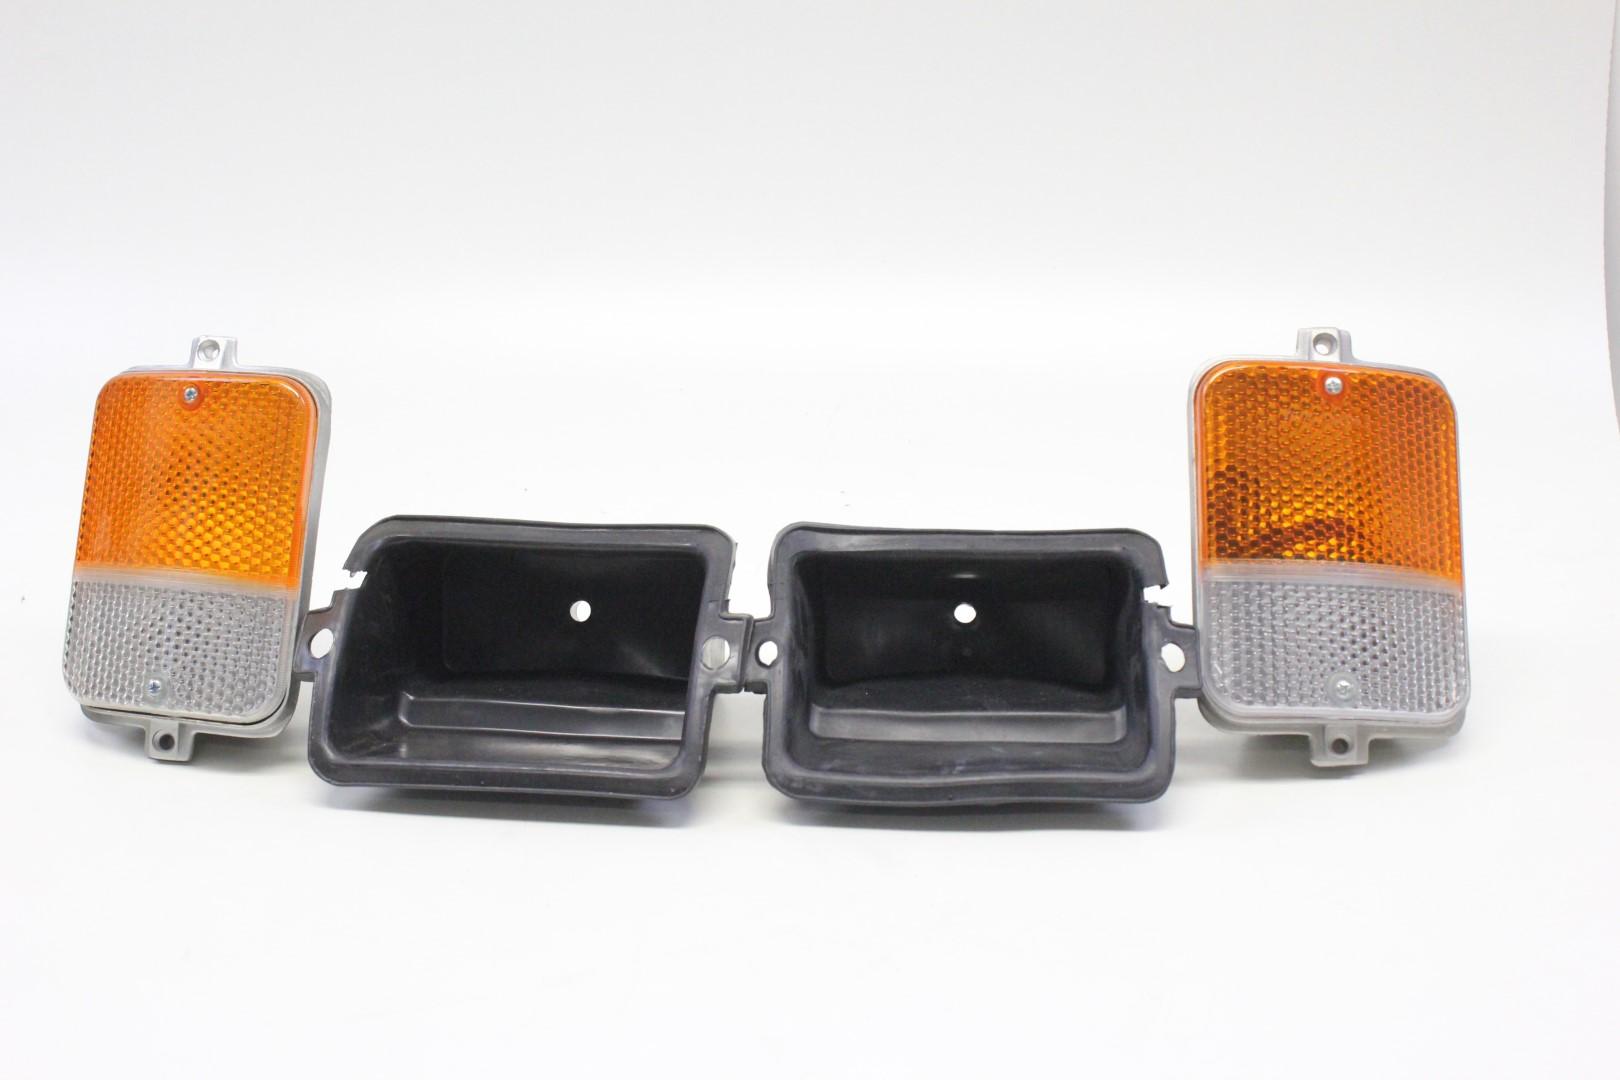 2x front turn signal light